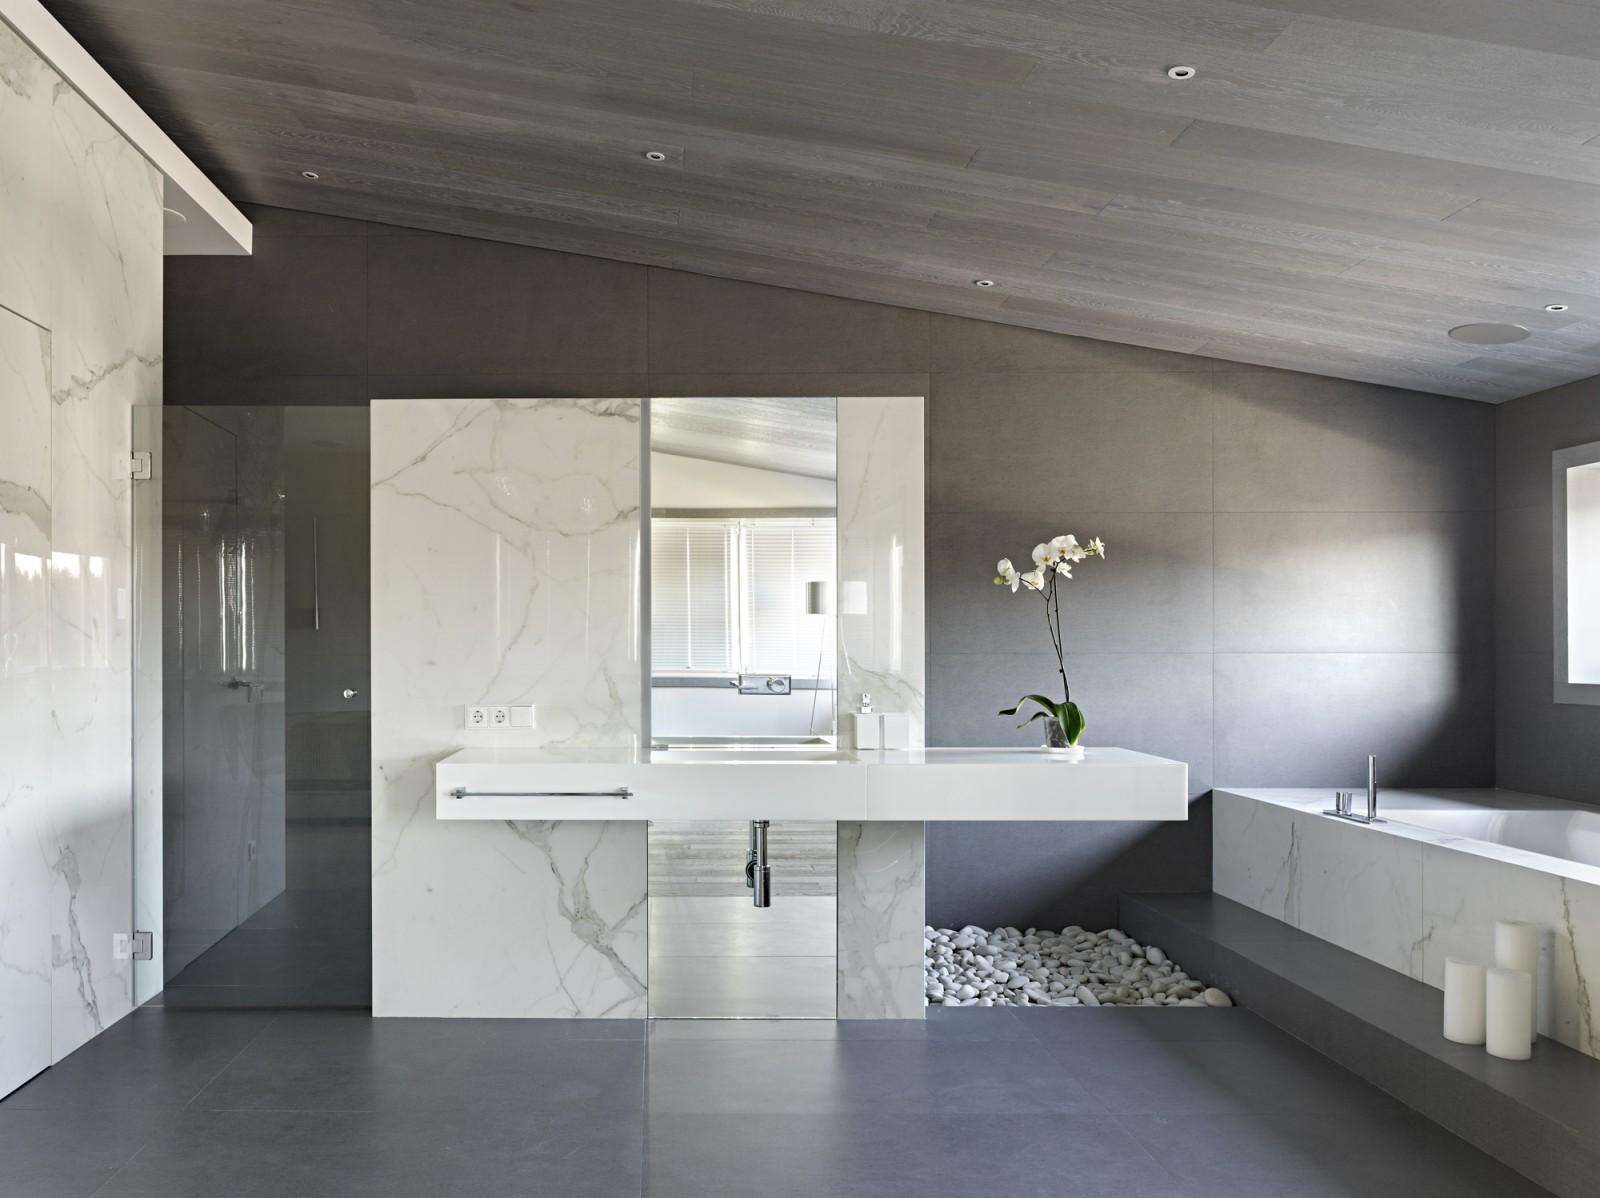 Nice villa interior by architectural Bureau of Alexandra Fedorova - 15